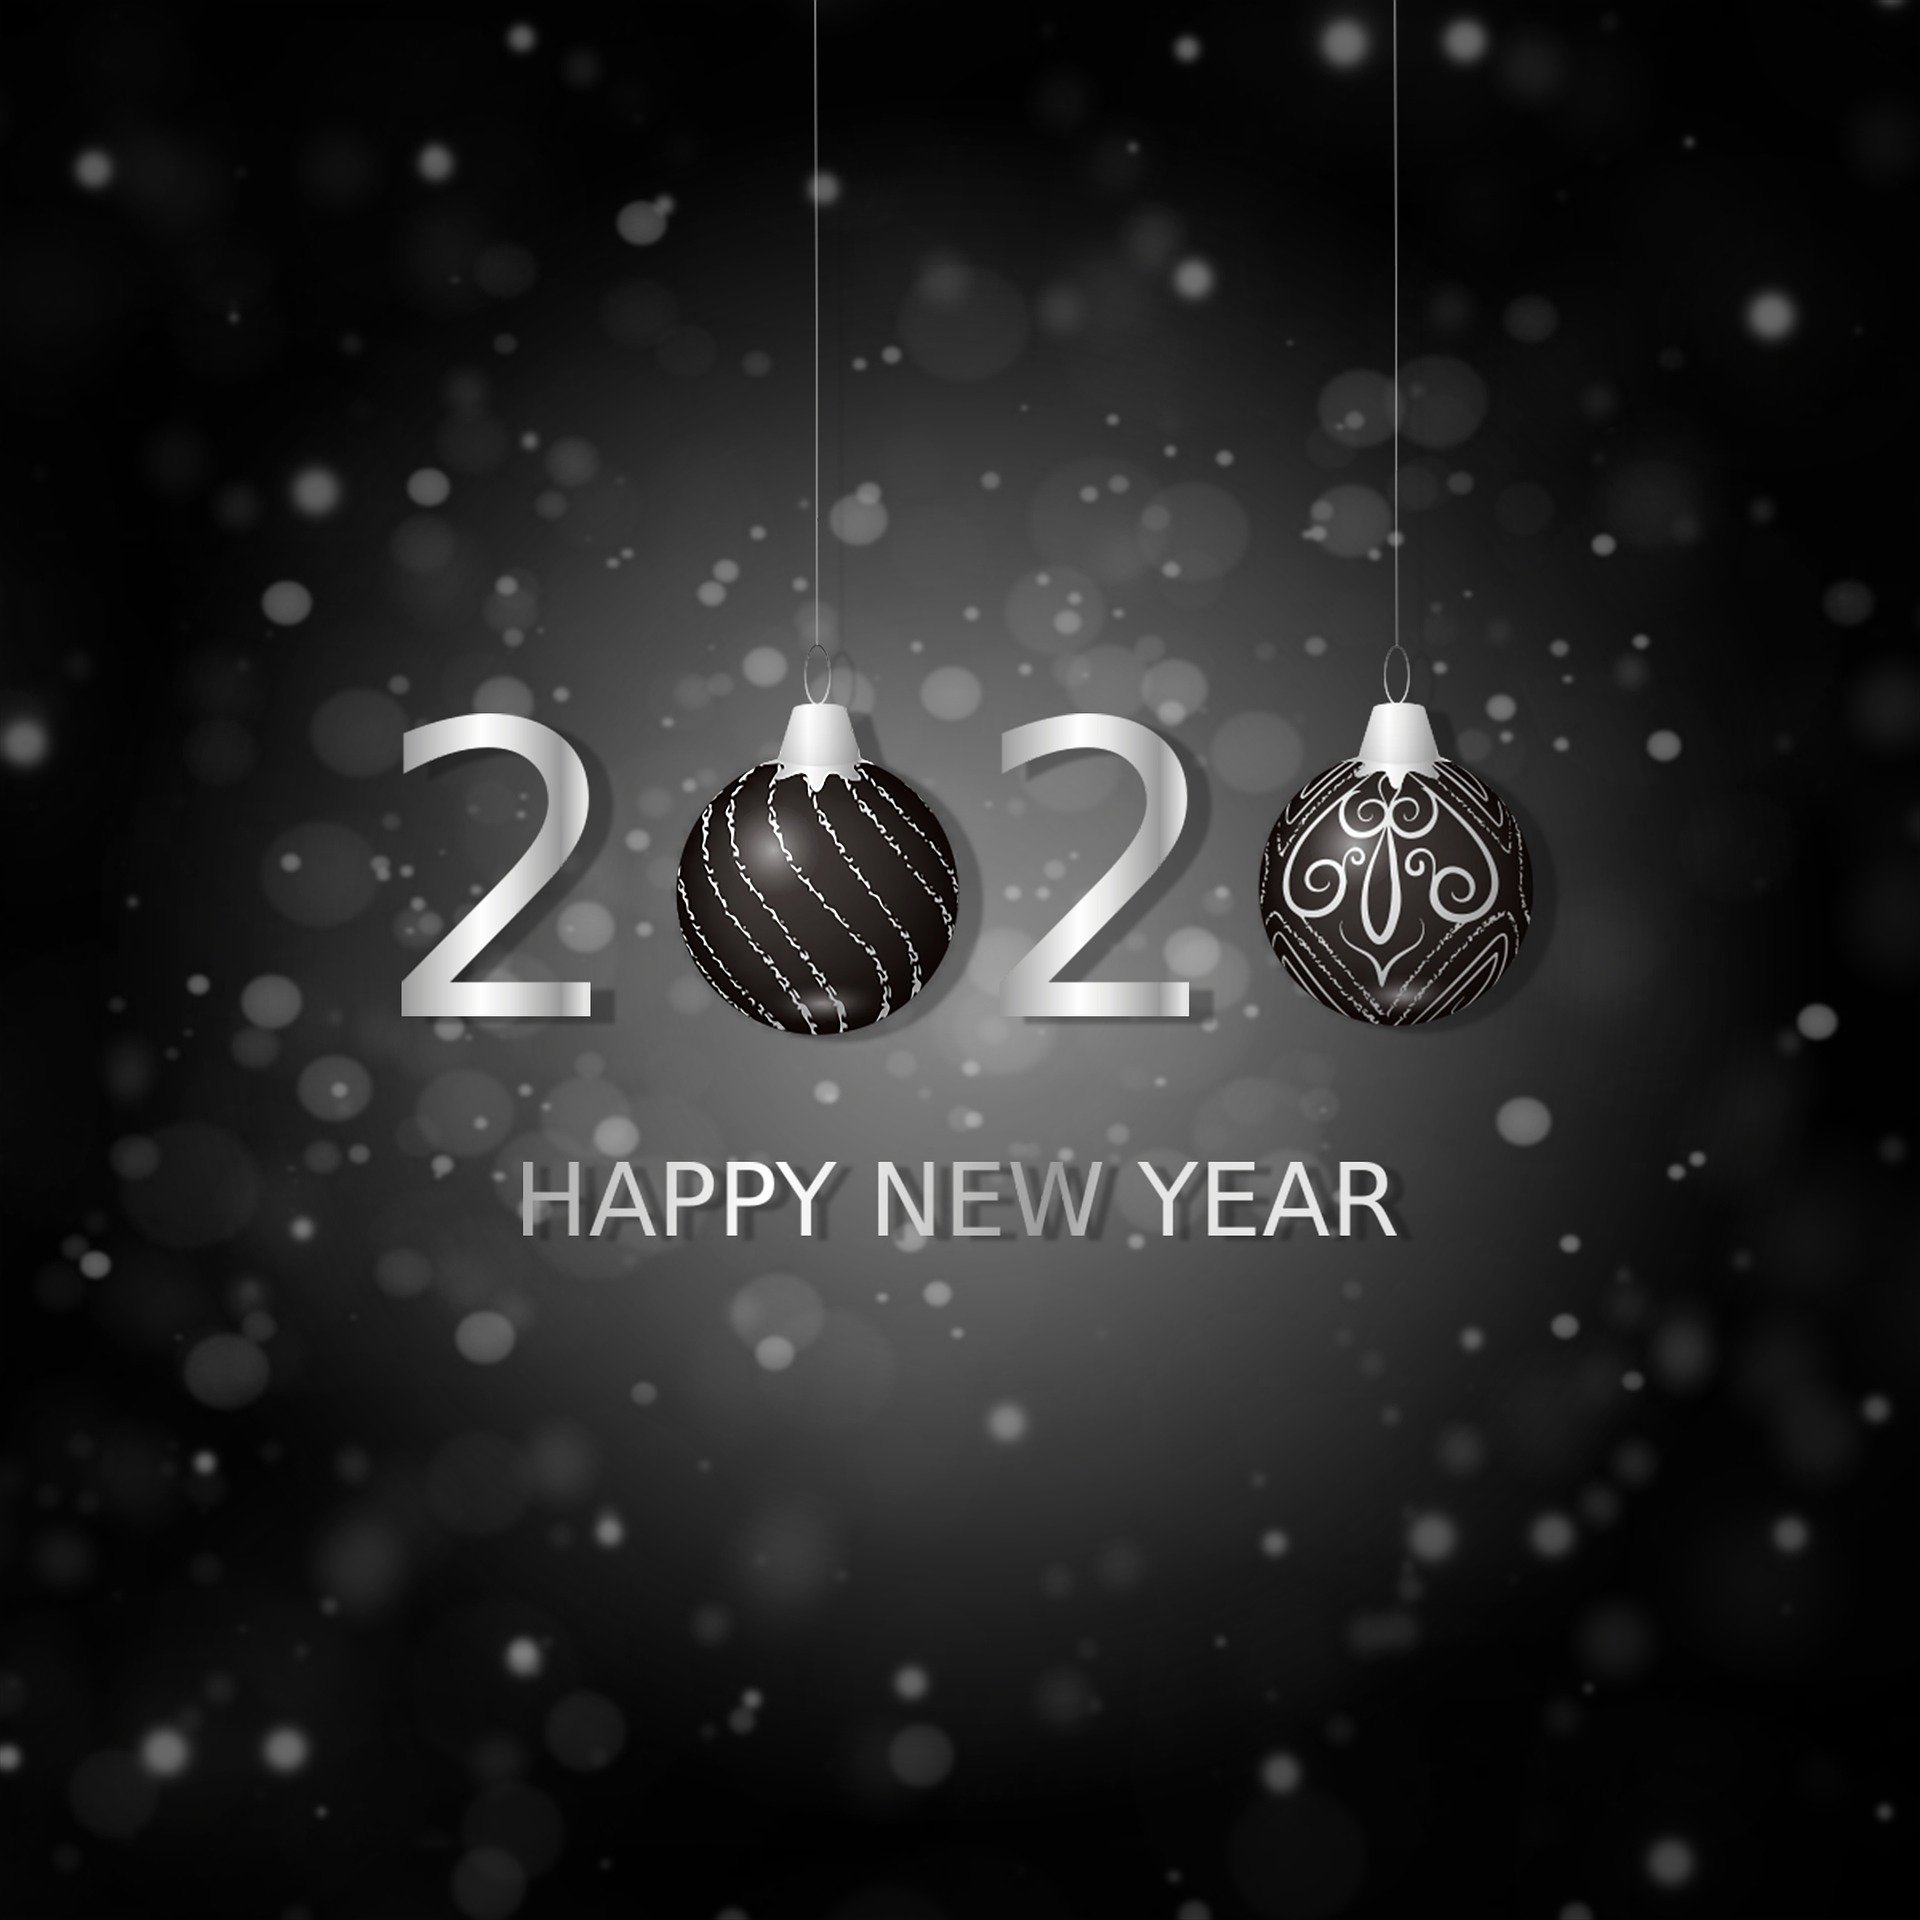 happy-new-year-4647004_1920